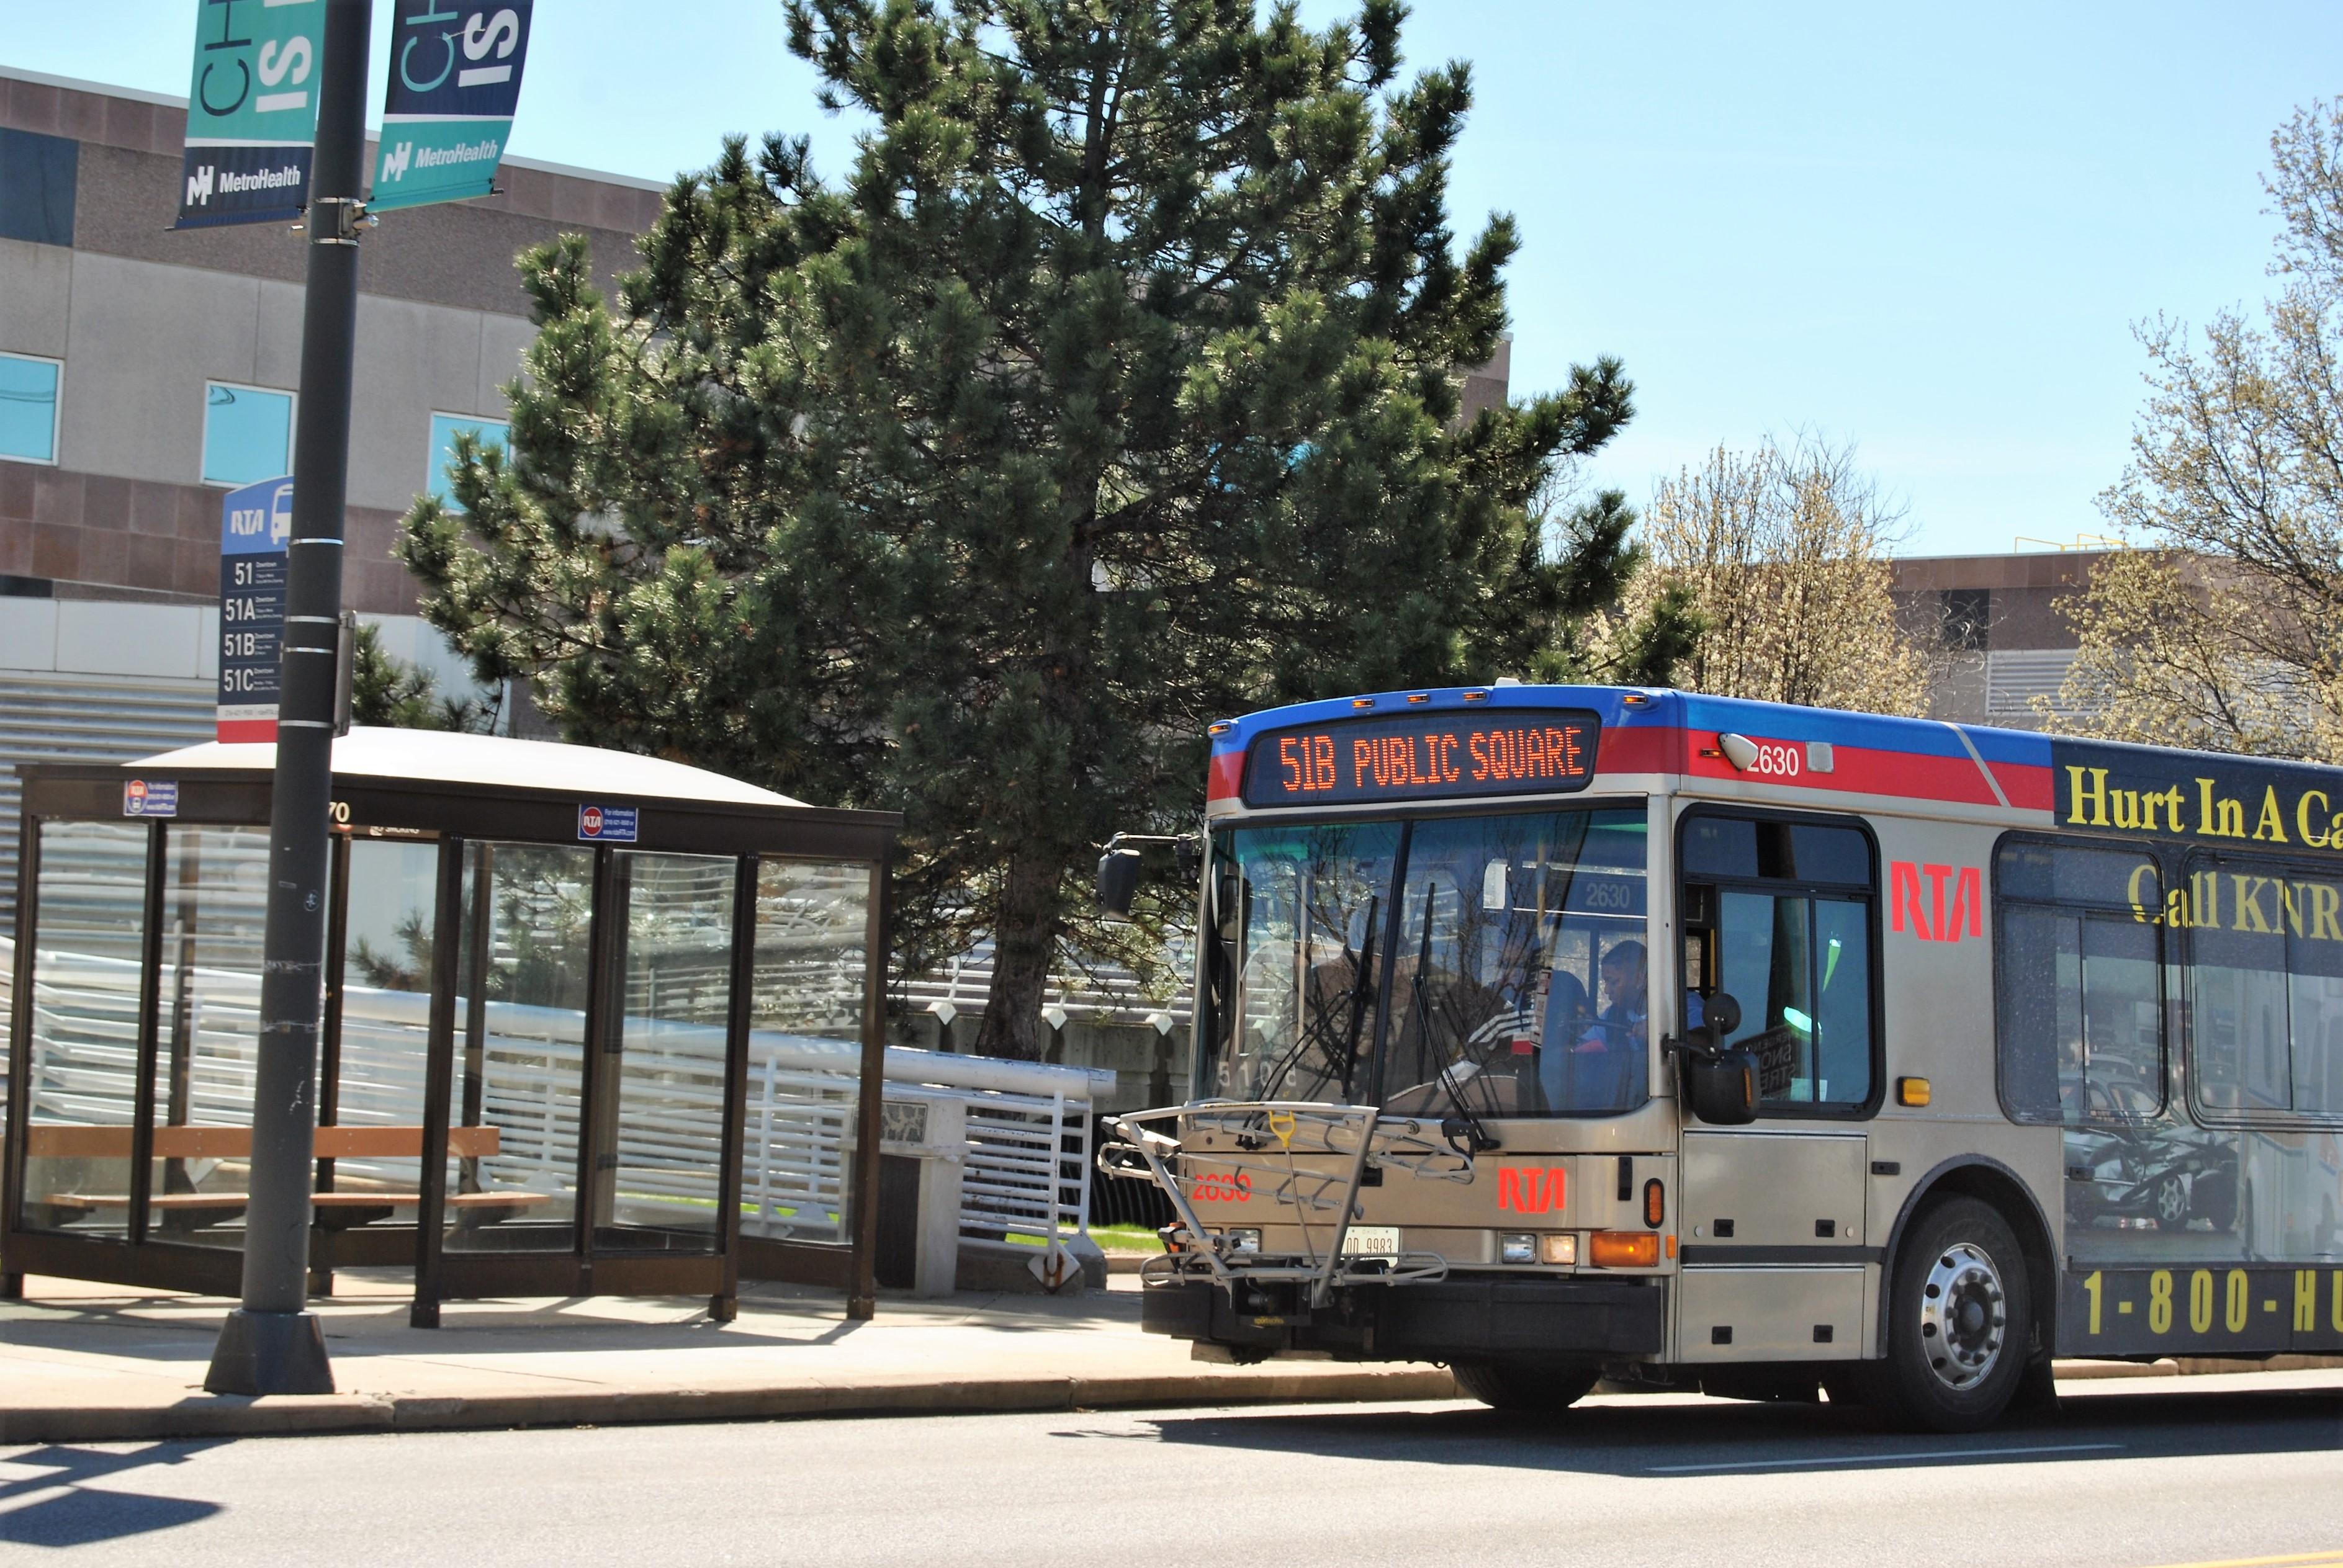 A 51 bus serves Metro Health on West 25th Street